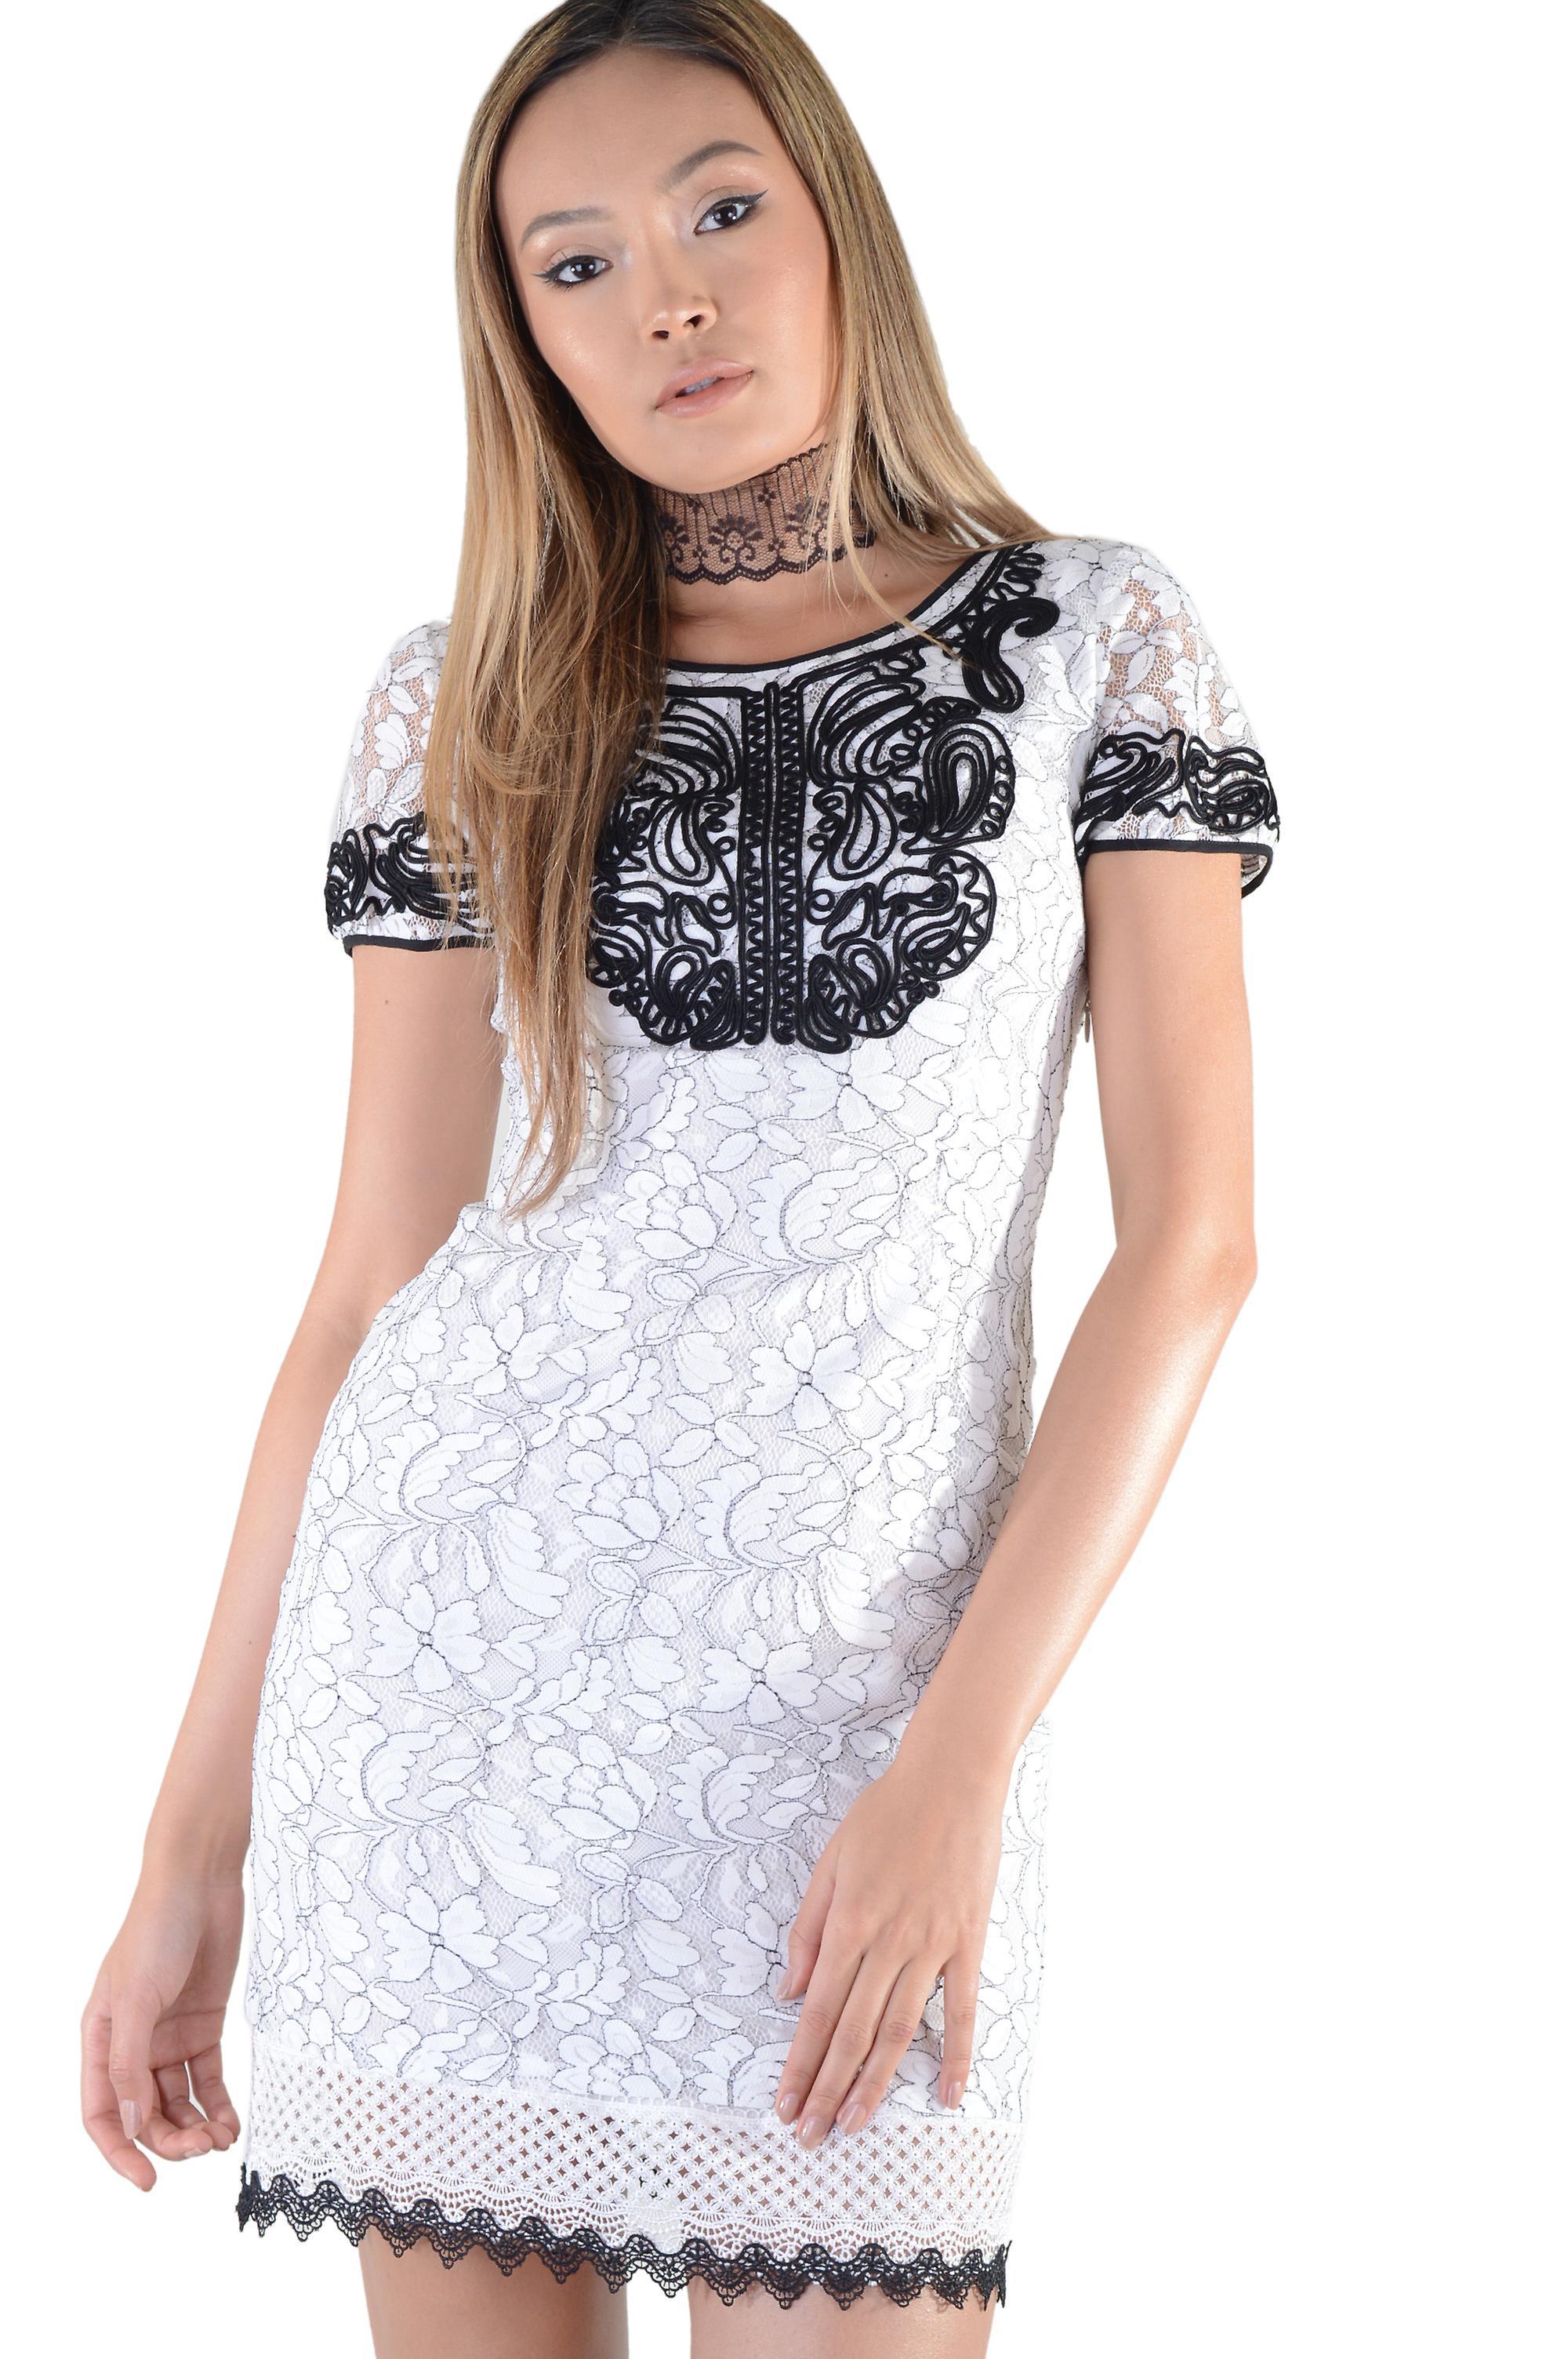 9641948f7c335 LMS Black Piping Detail And Crochet Hem White Lace Dress | Fruugo